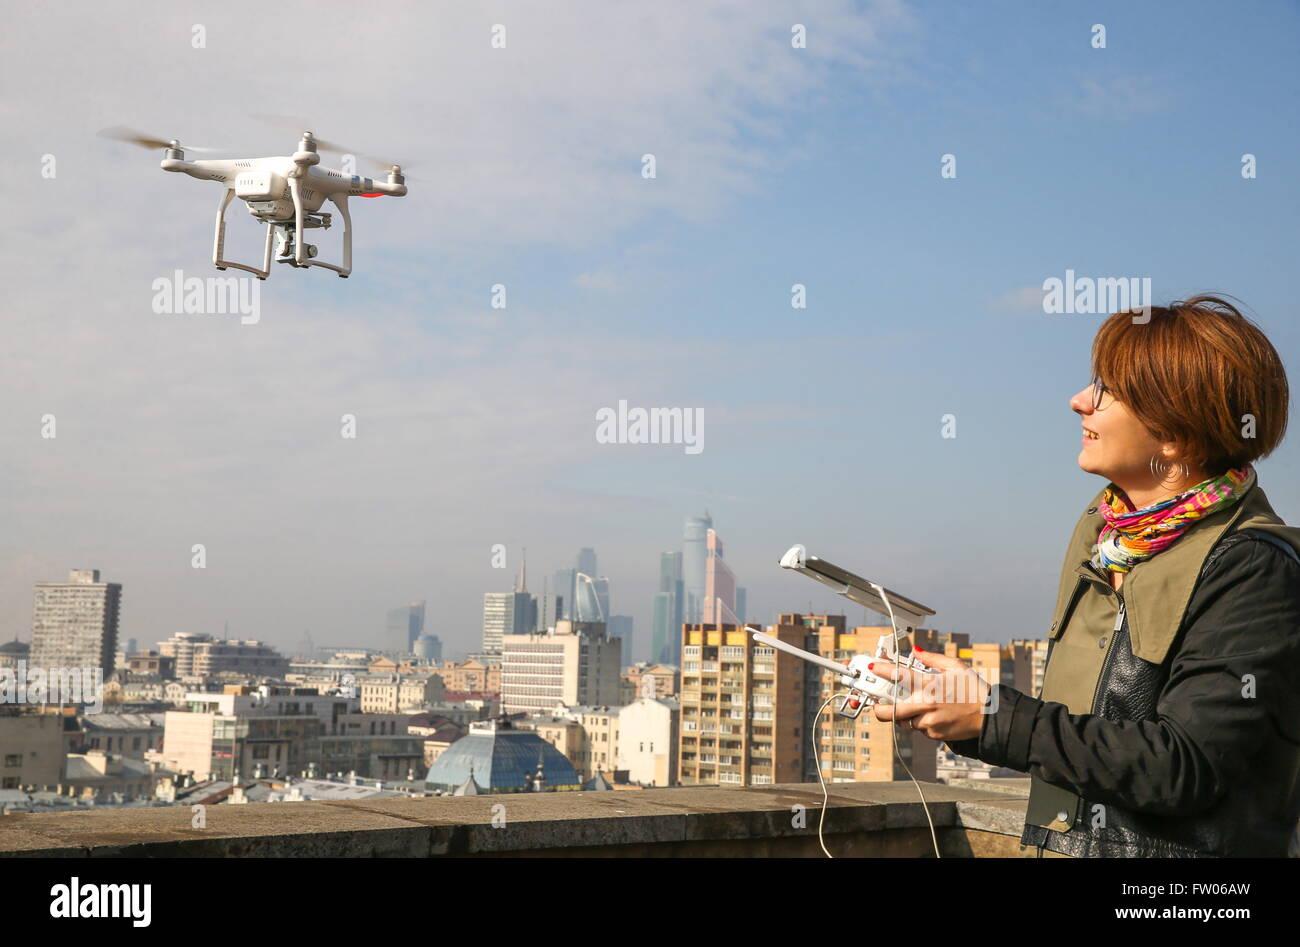 dronex pro uk